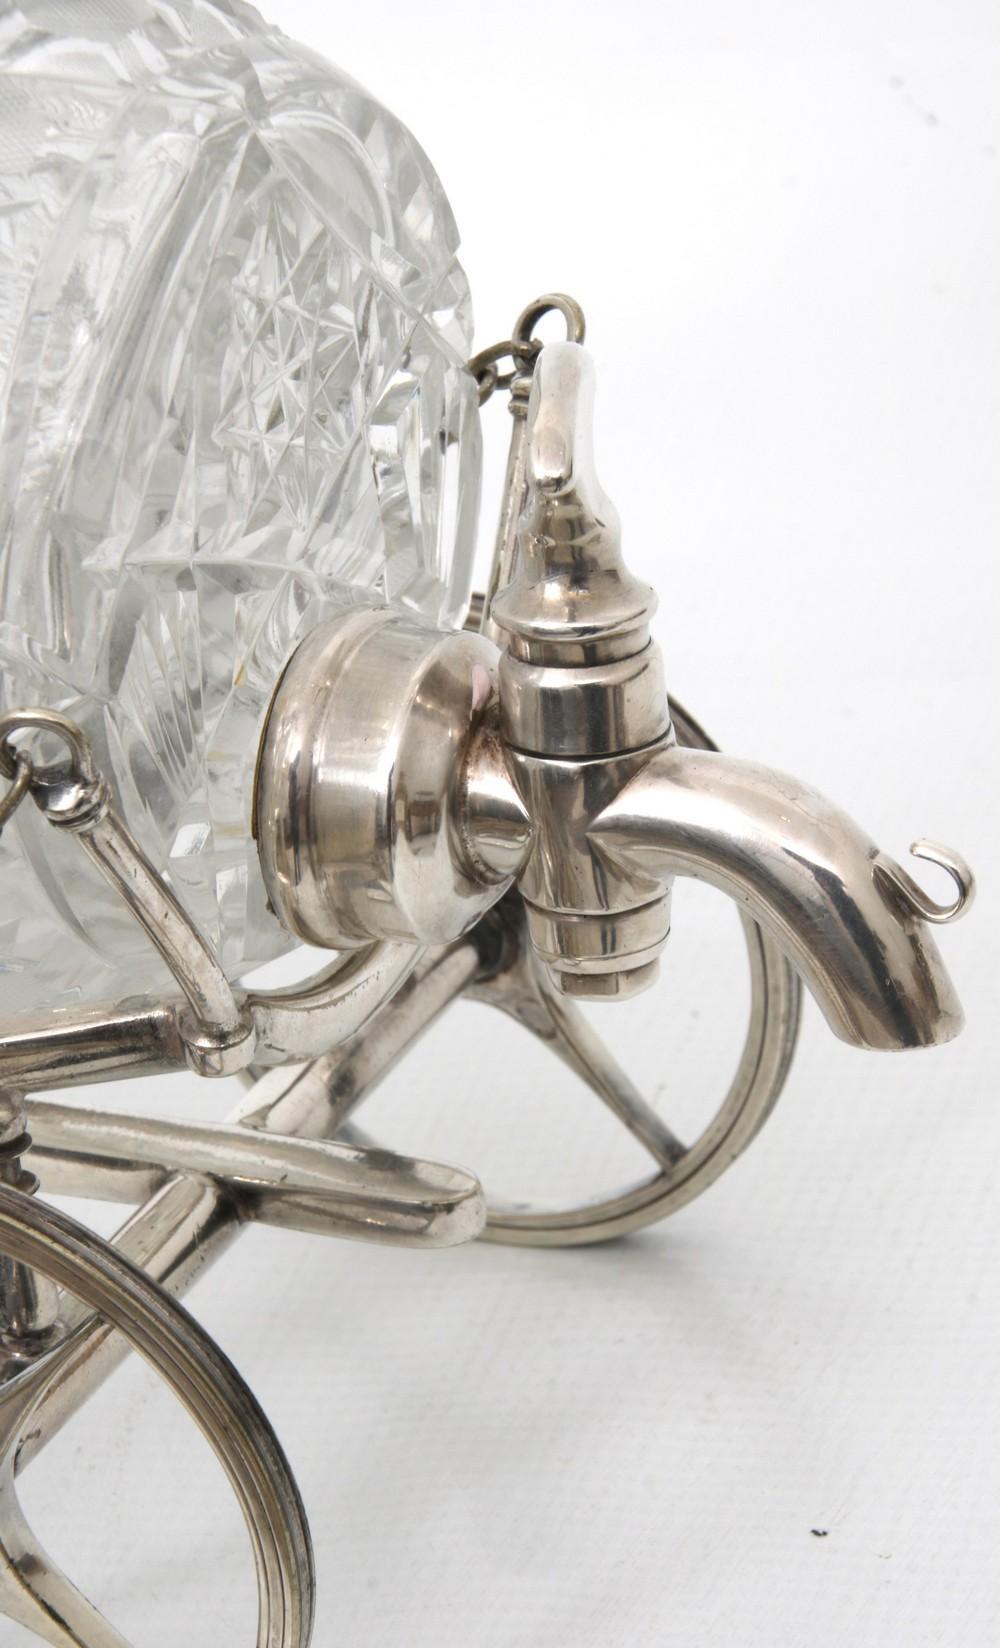 Brilliant Cut Glass Barrel Decanter on Wagon